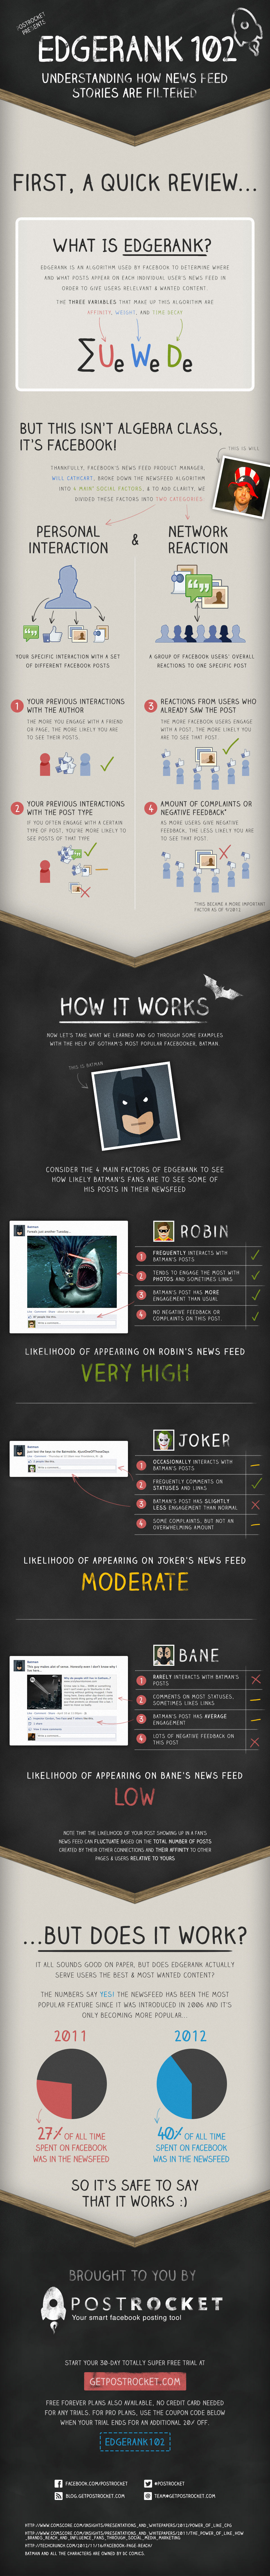 Infografik: Batman und Robin erklären den Newsfeed Algorithmus